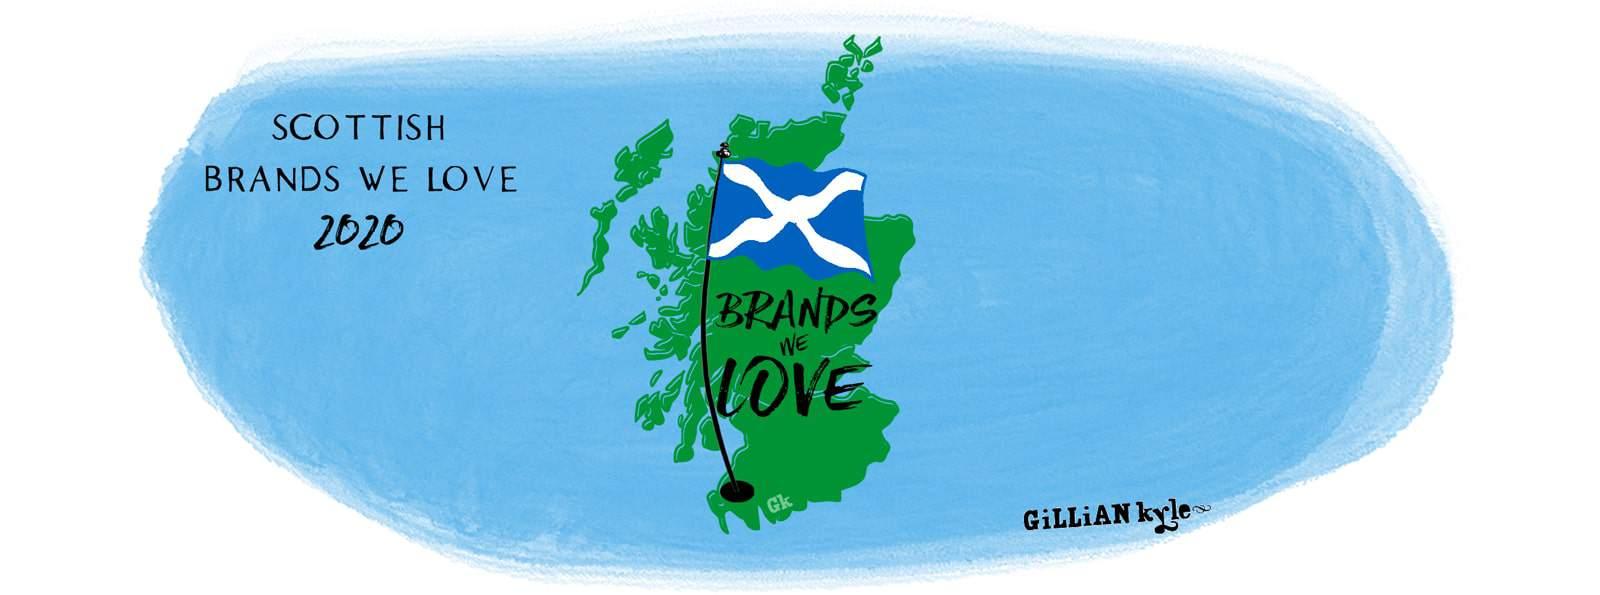 Scottish brands we love 2020 illustration by Gillian Kyle